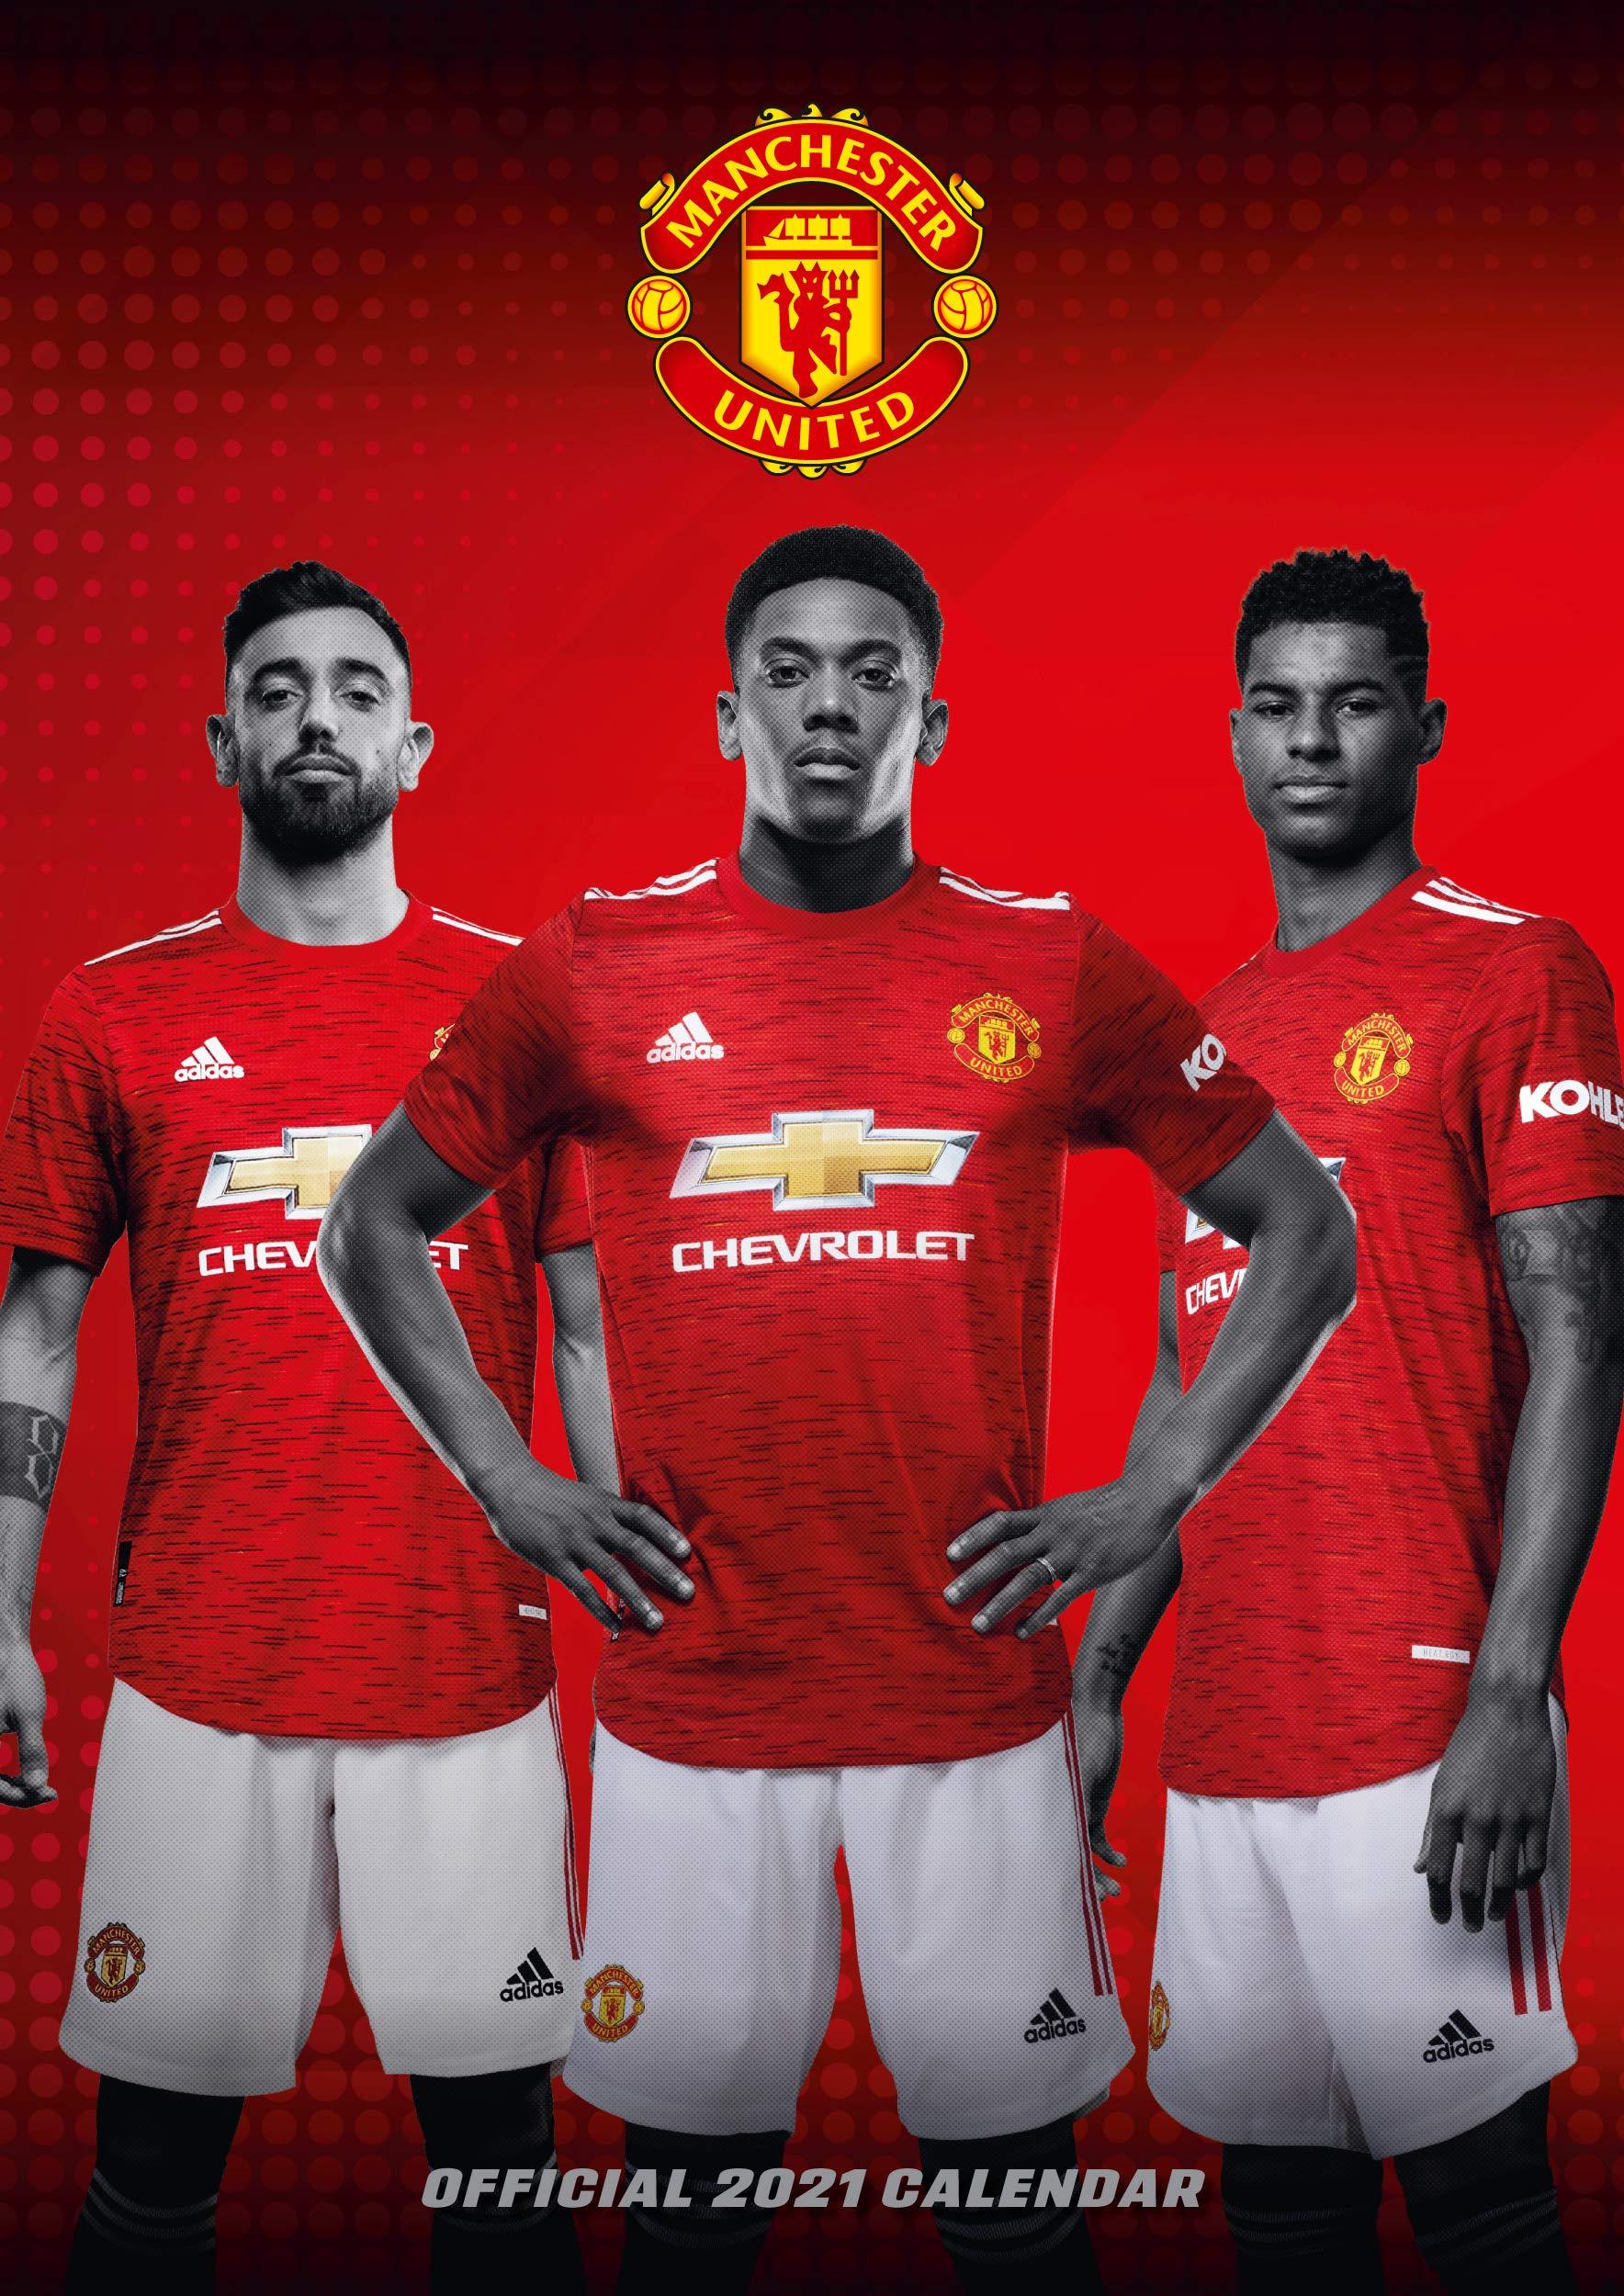 Utd Calendar 2021 Manchester United 2021 Calendar